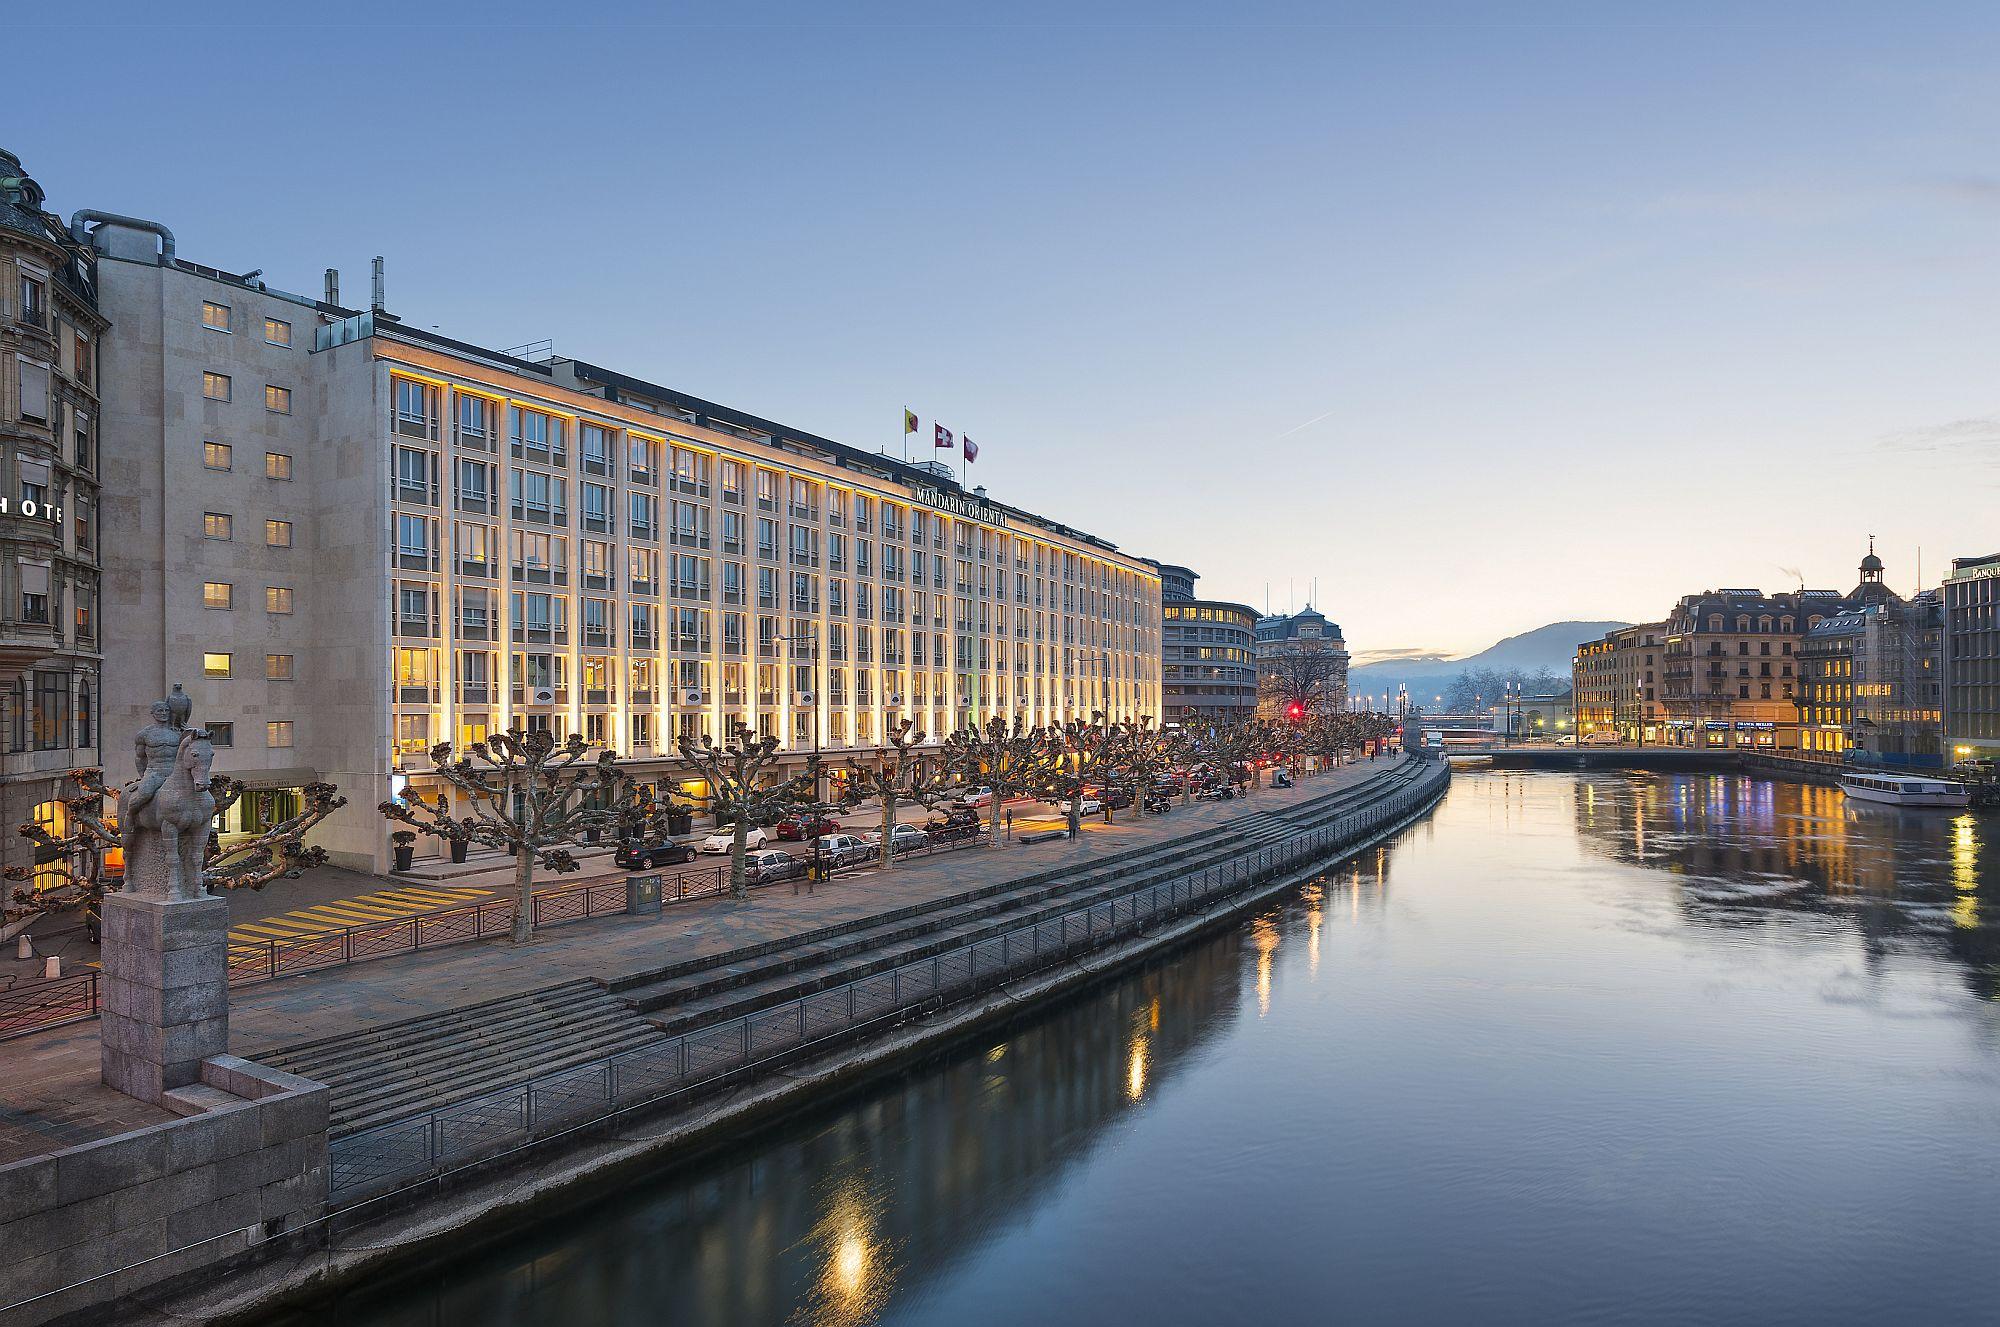 Amazing luxury hotel with lake view in Geneva – Mandarin Oriental